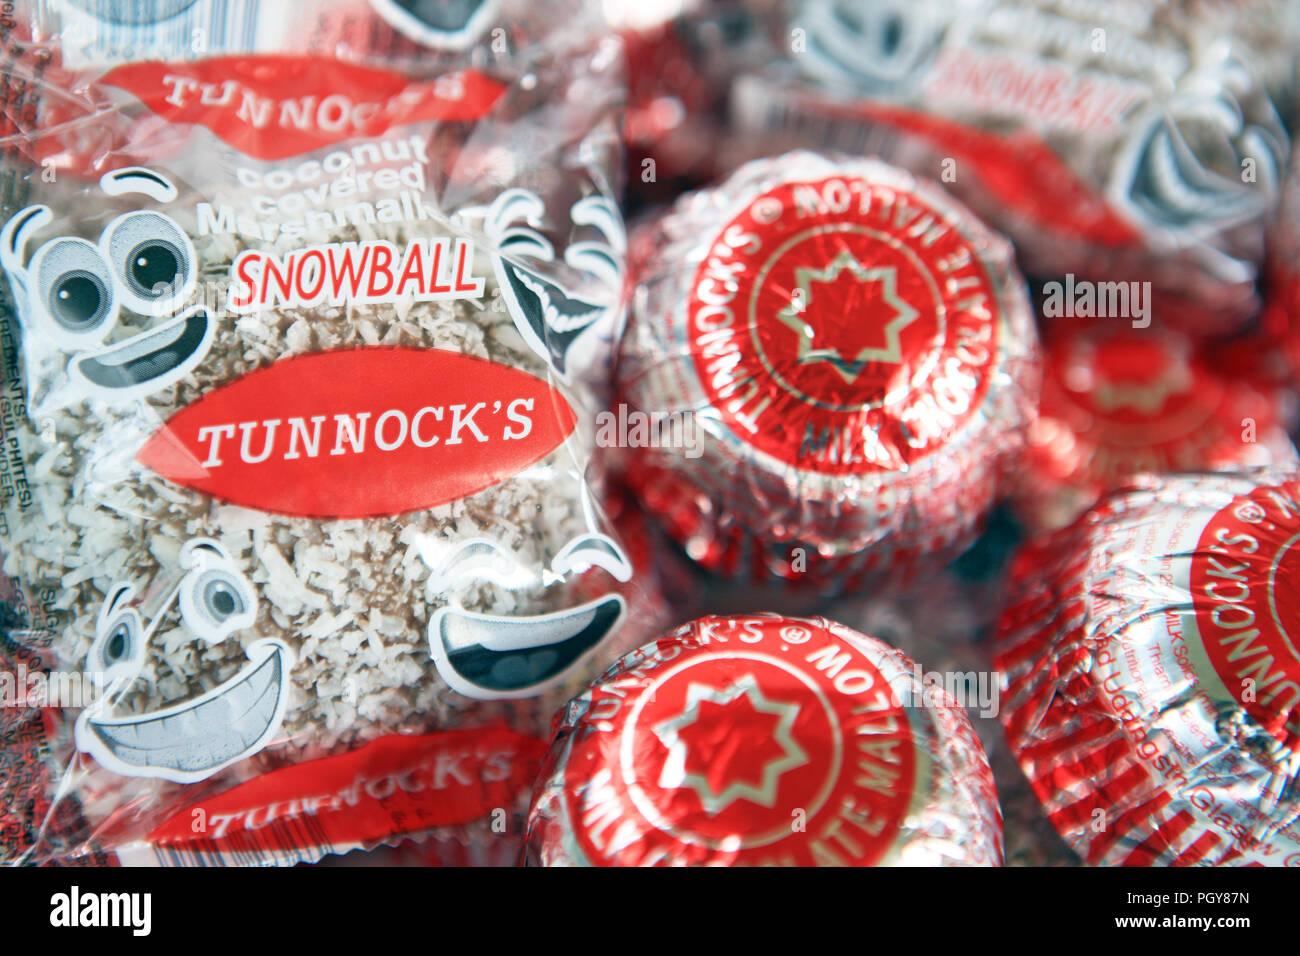 Tunnocks tea cakes - Stock Image